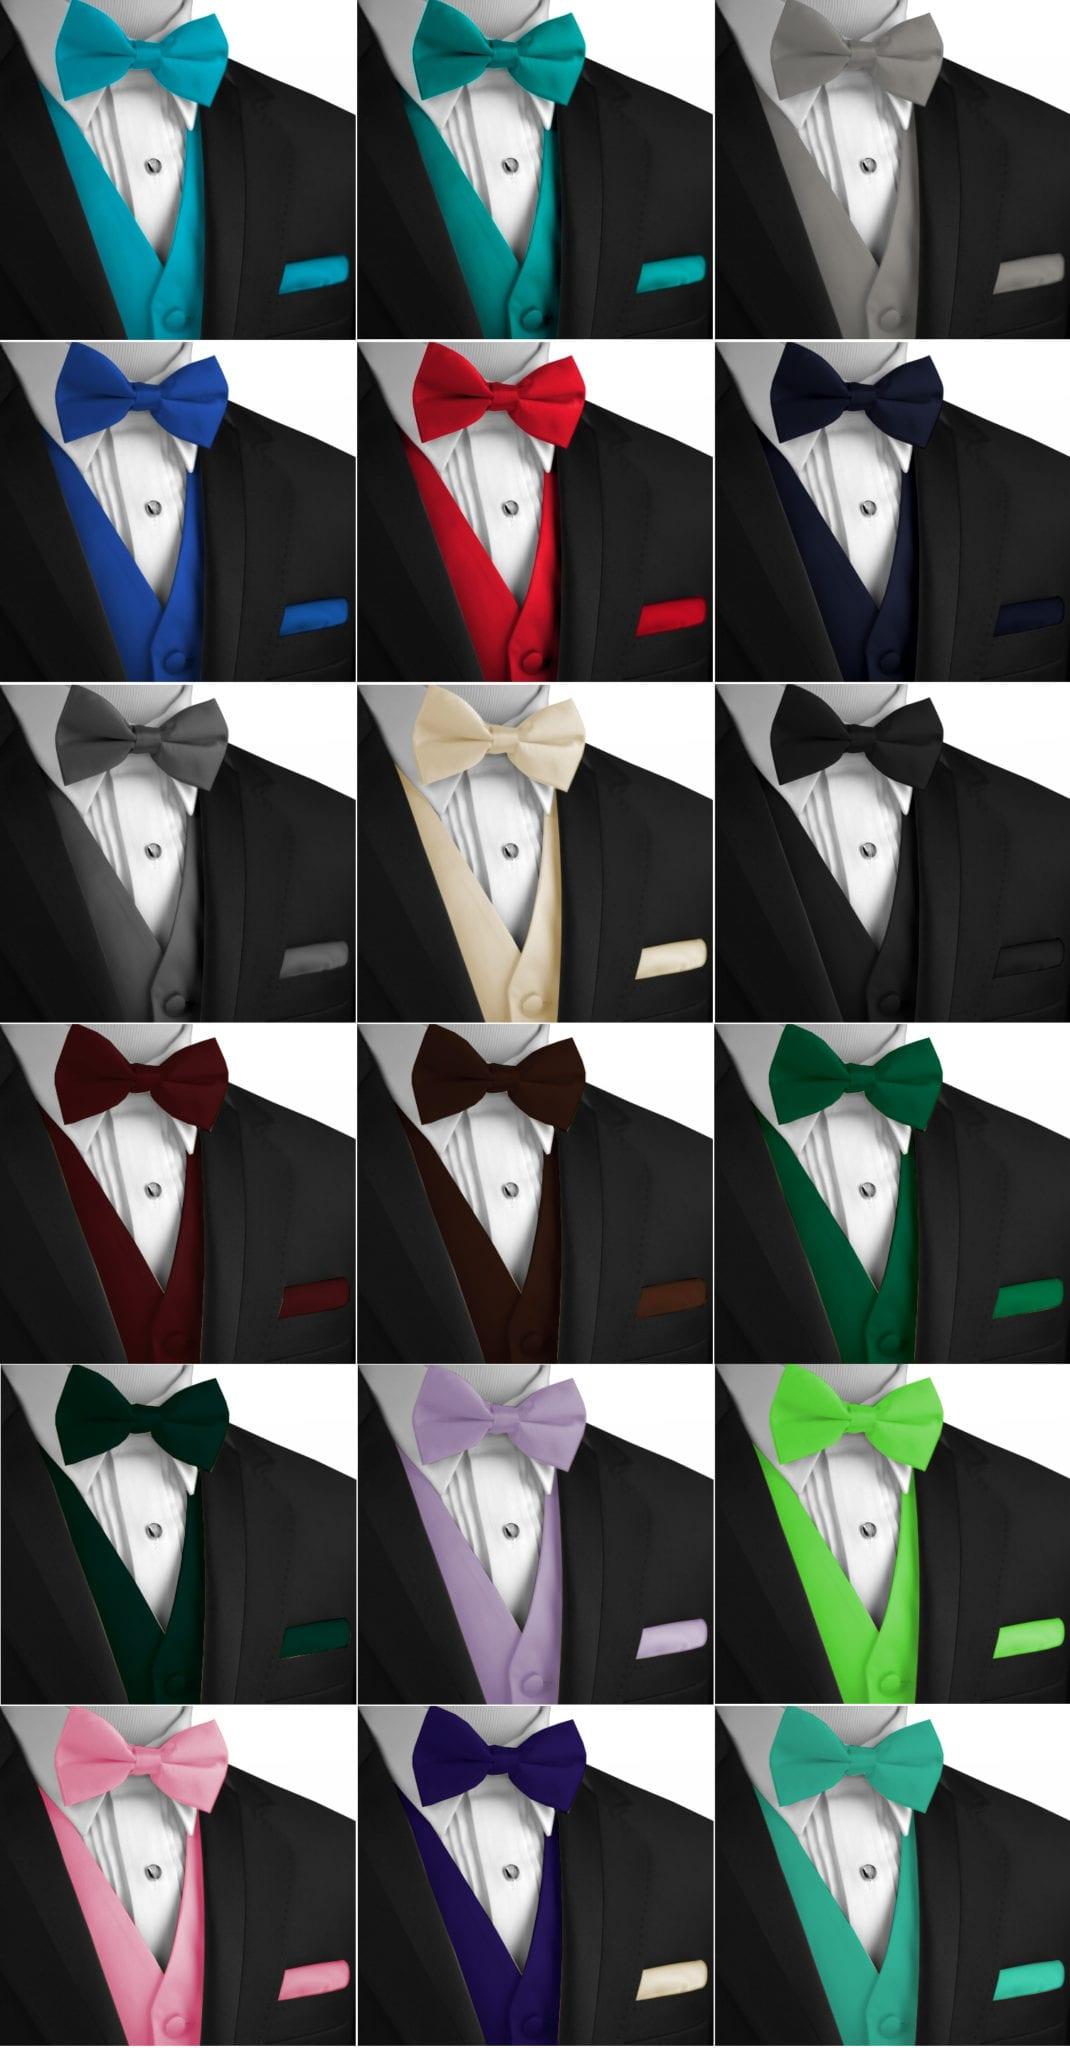 f0755d3d586 Best Tuxedo Vest, Bow-Tie & Hankie Set - Best Tuxedo